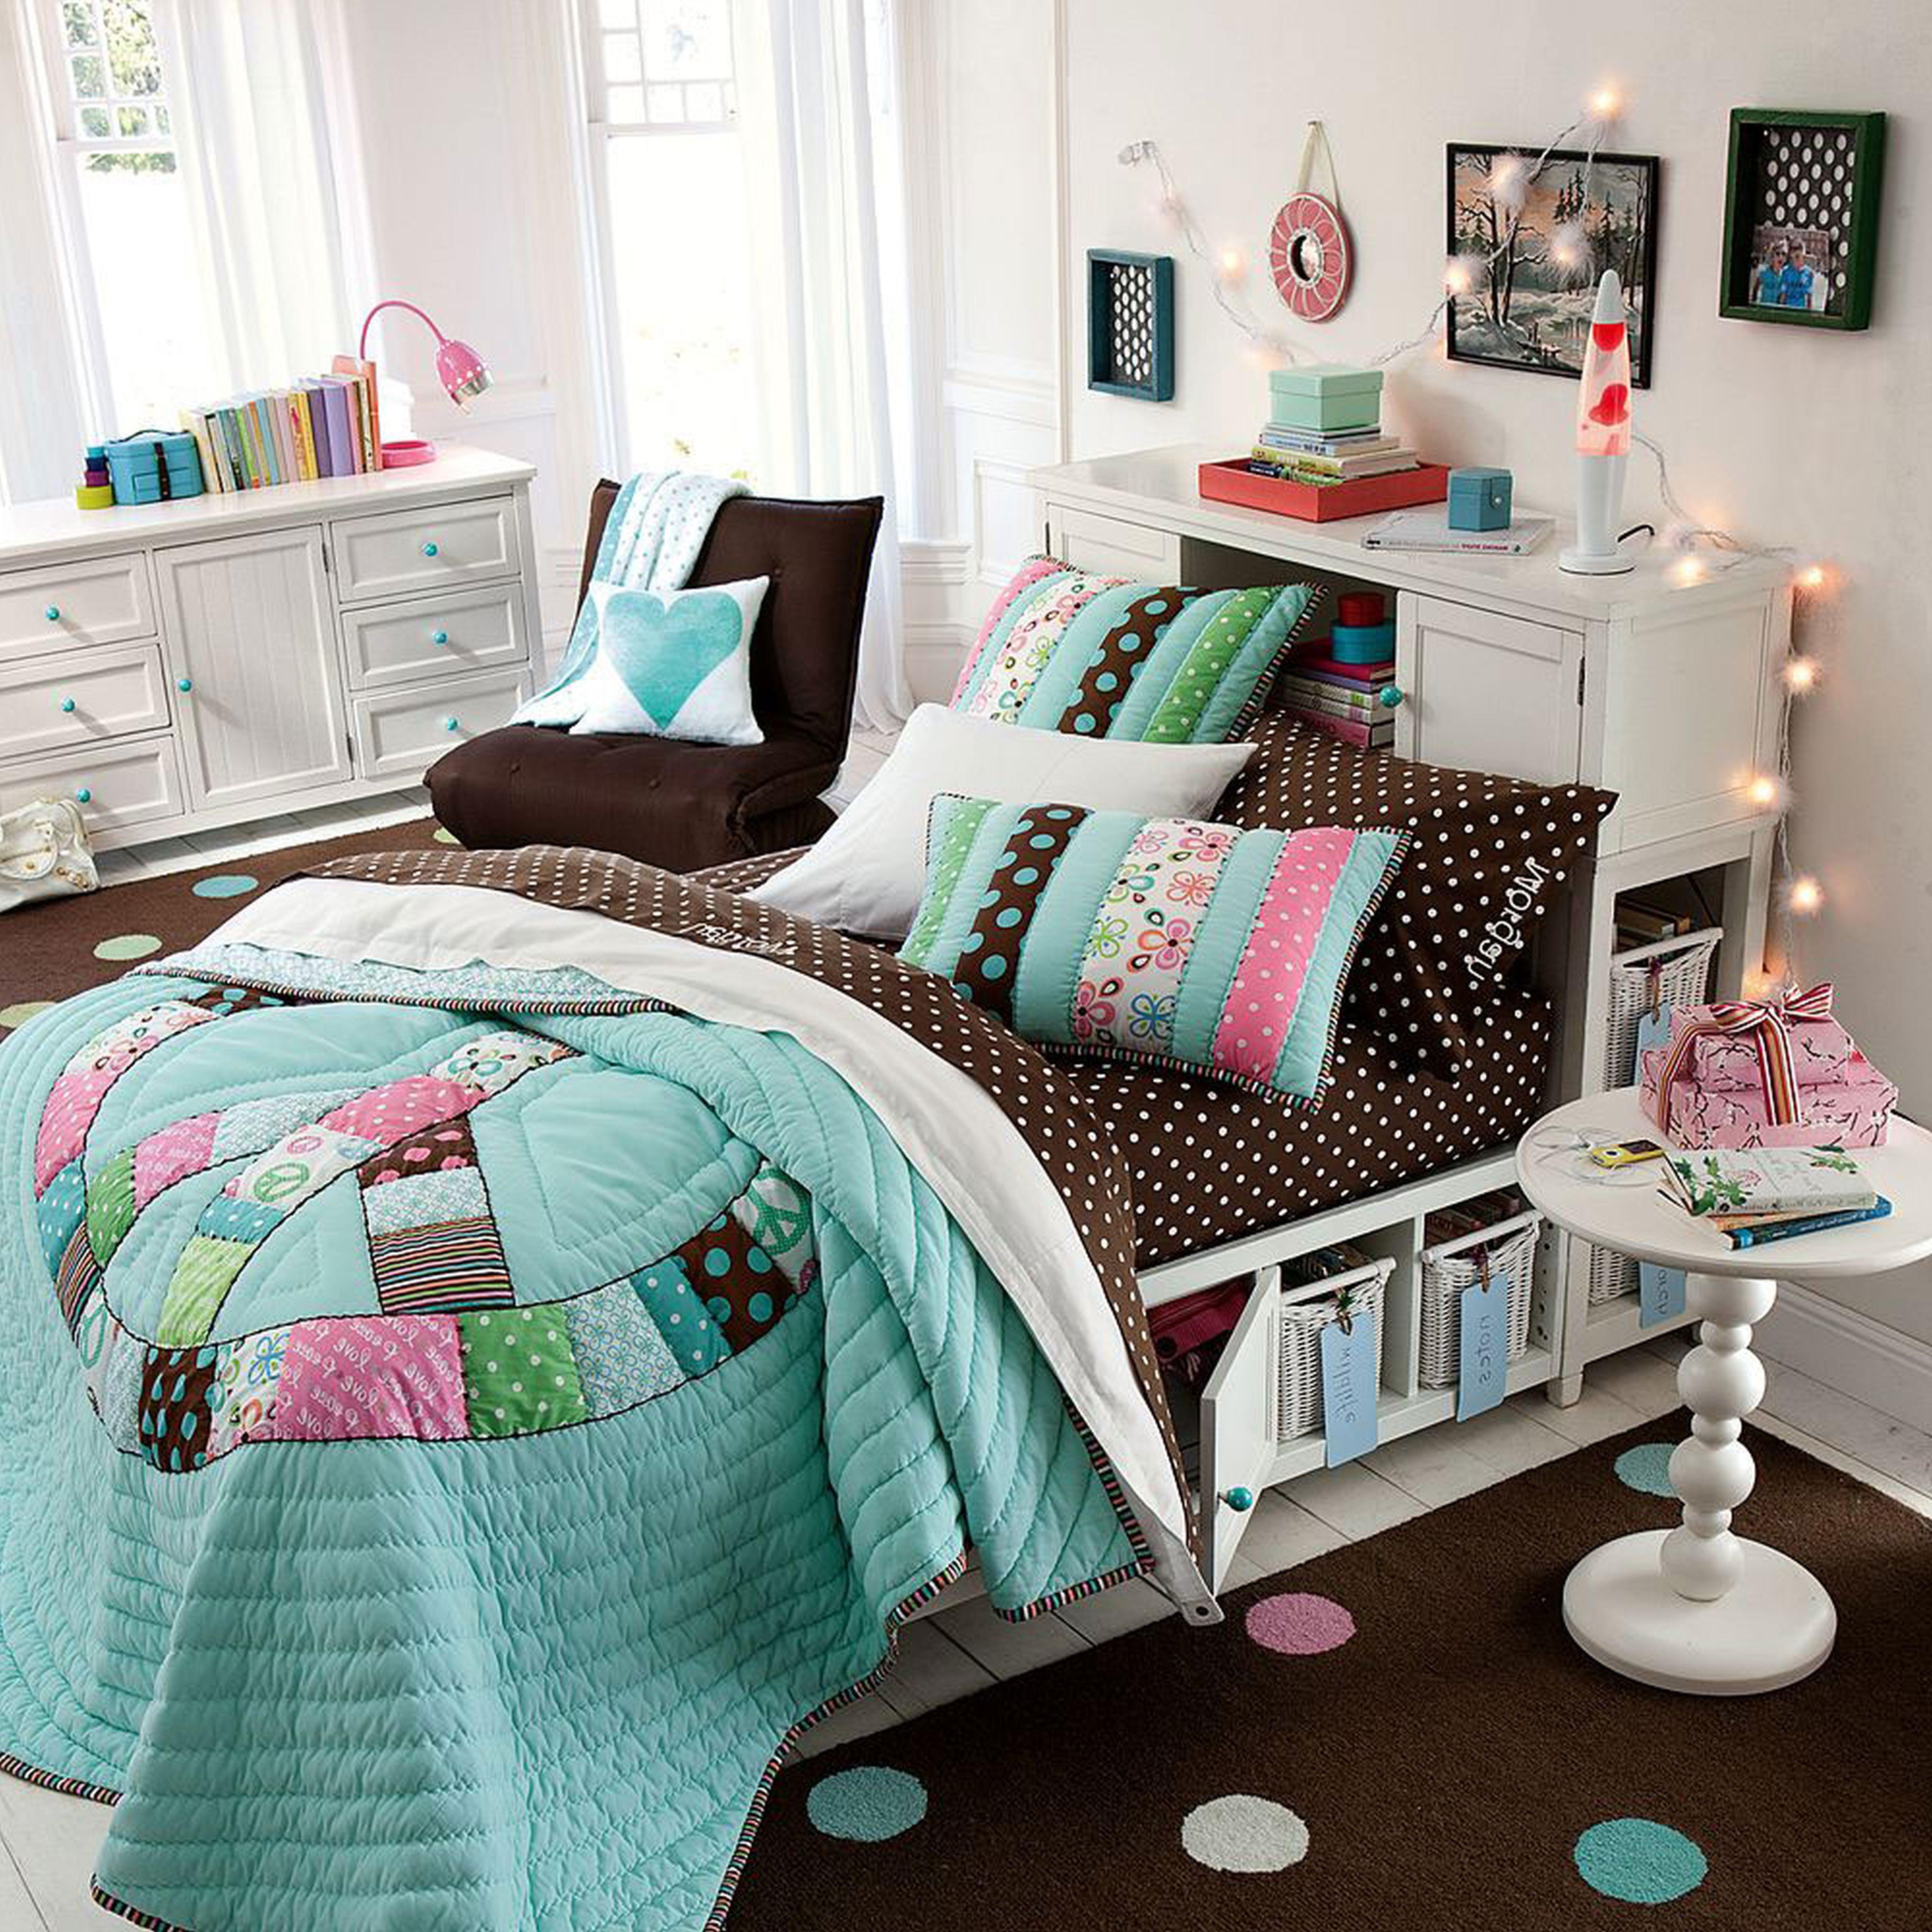 Full Size Of Bedroom Bedroom Ideas For Teenage Girls Bedroom Undolock For Cute Room Ideas & Full Size Of Bedroom Bedroom Ideas For Teenage Girls Bedroom ...